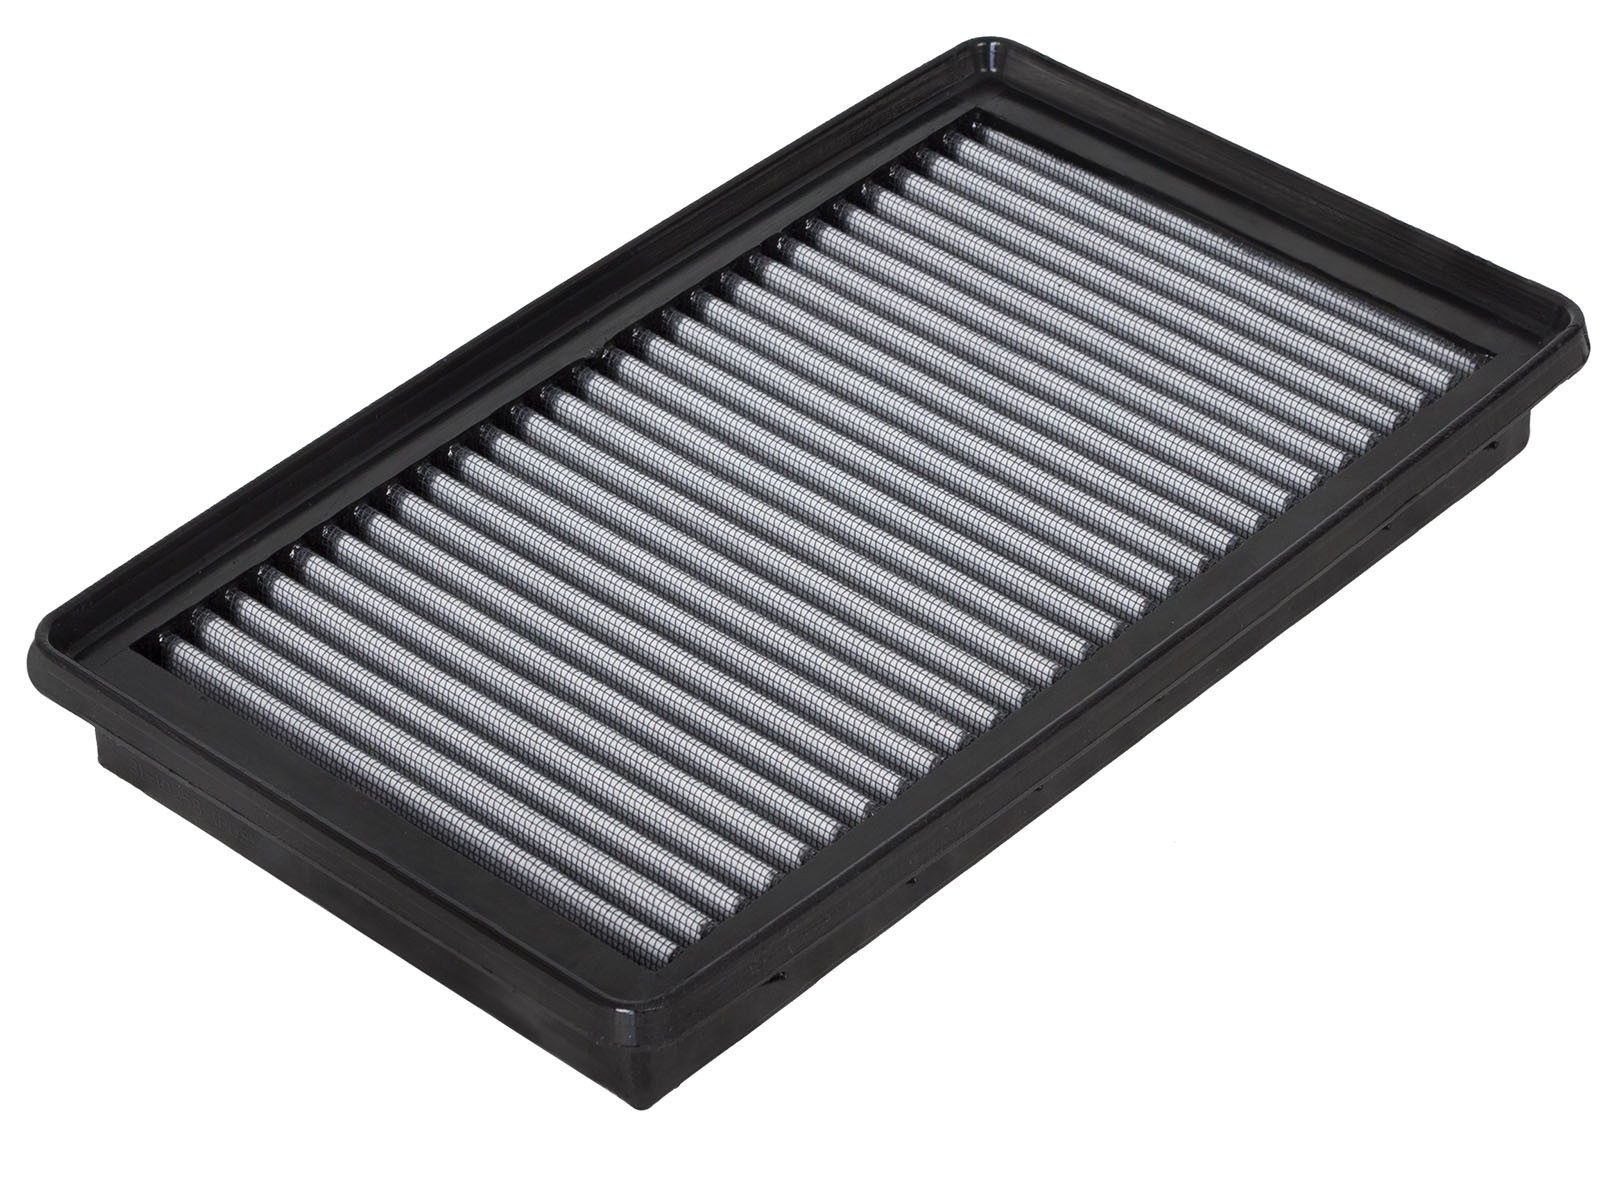 aFe POWER 31-10258 Magnum FLOW Pro DRY S Air Filter